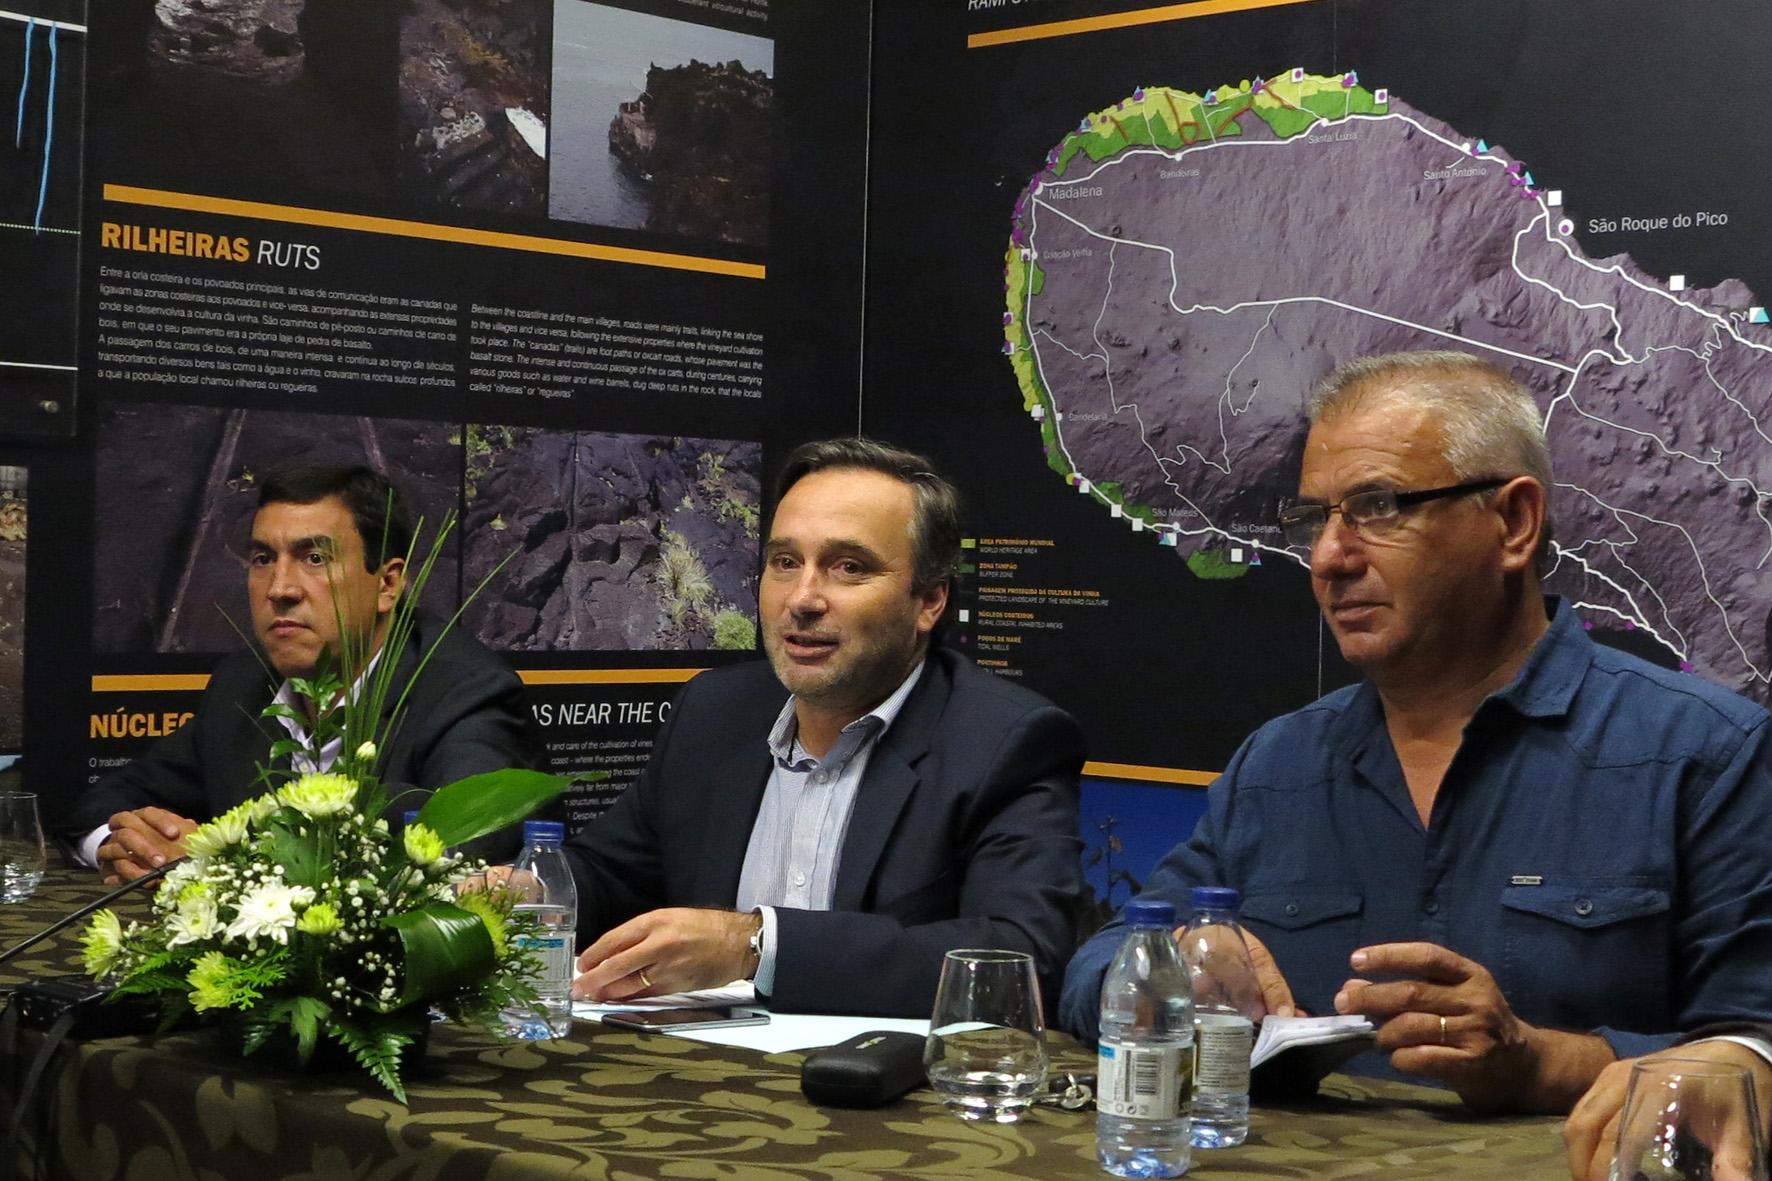 Complementaridade de oferta entre ilhas deve nortear o desenvolvimento do setor do Turismo, afirma Vítor Fraga